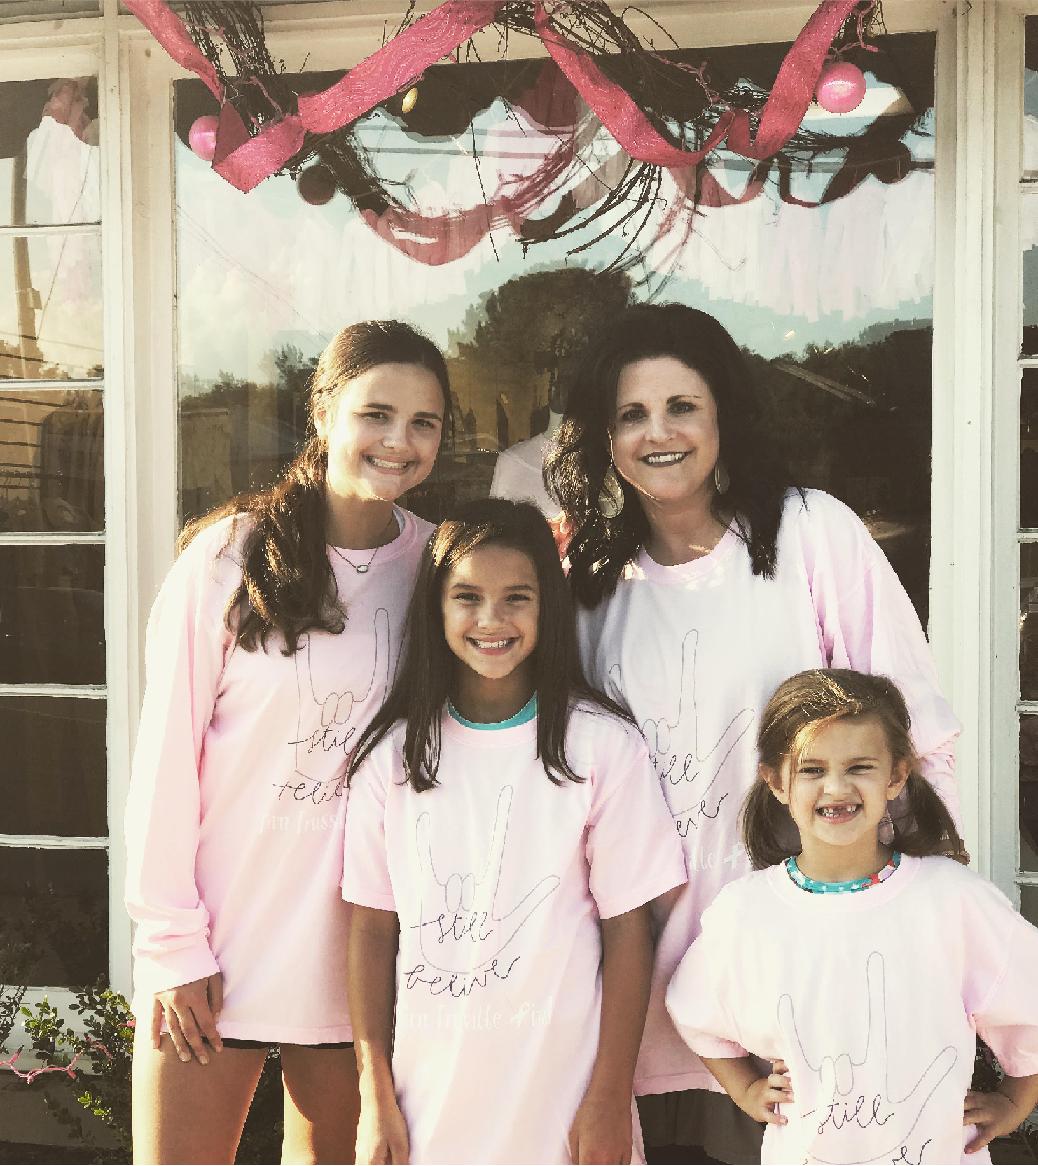 Turn Trussville Pink 2018: Raising funds, raising awareness and honoring Kathy White